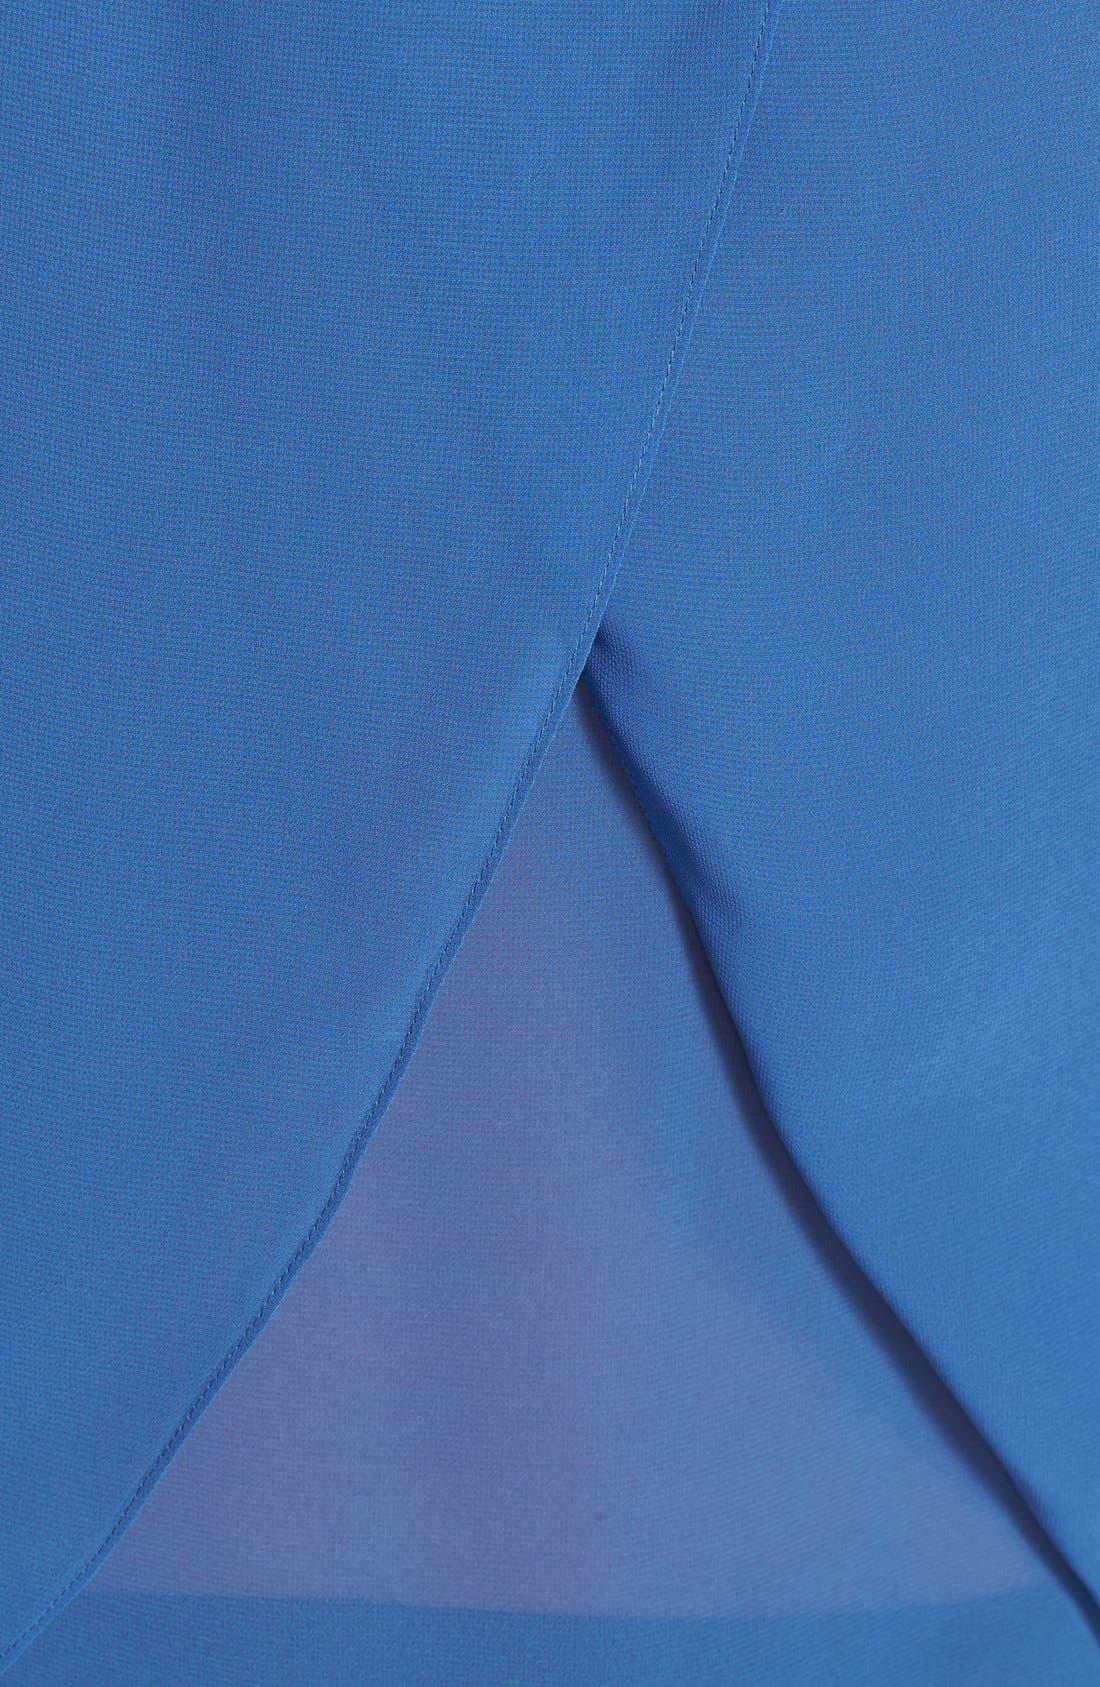 Alternate Image 3  - Kenneth Cole New York 'Estelle' Wrap Back Scoop Neck Blouse